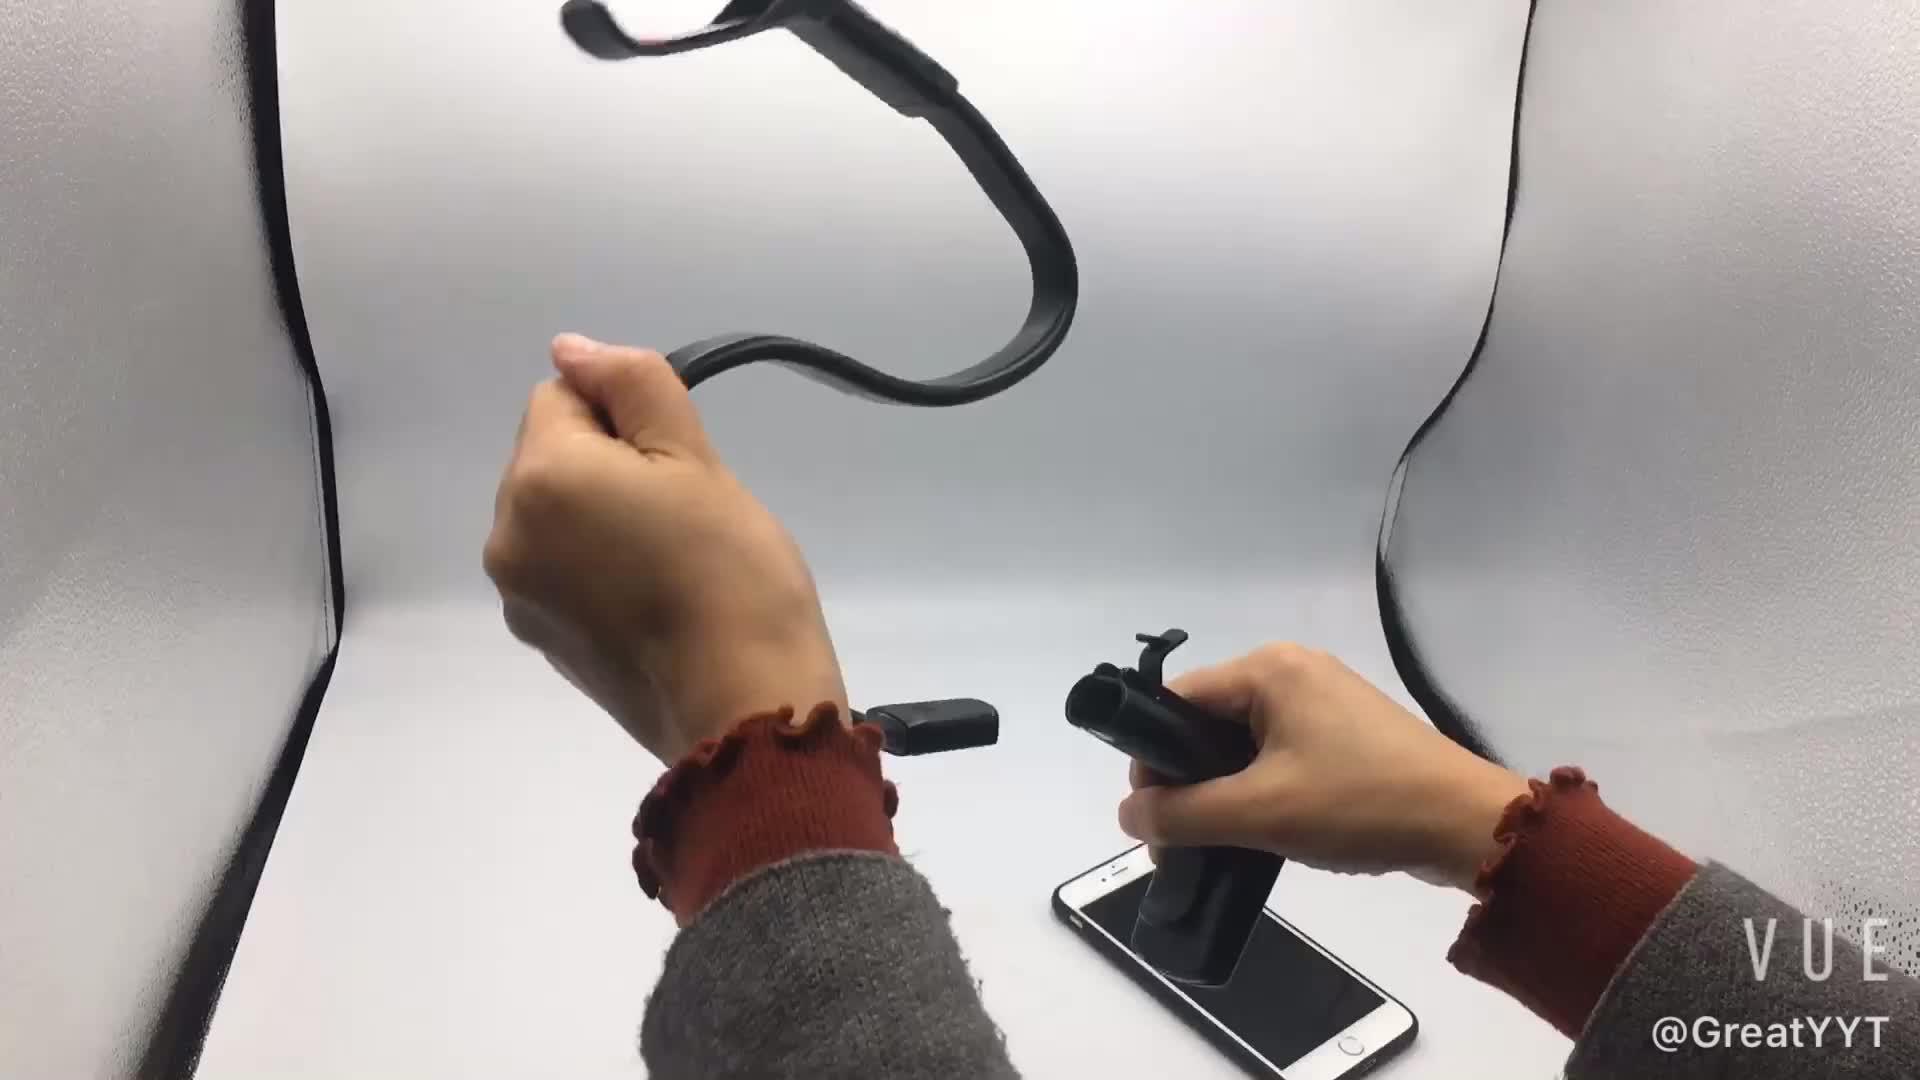 Gooseneck טלפון מחזיק, Lamicall טלפון Stand: מתכוונן עצלן מחזיק טלפון הר תואם עם באיכות גבוהה